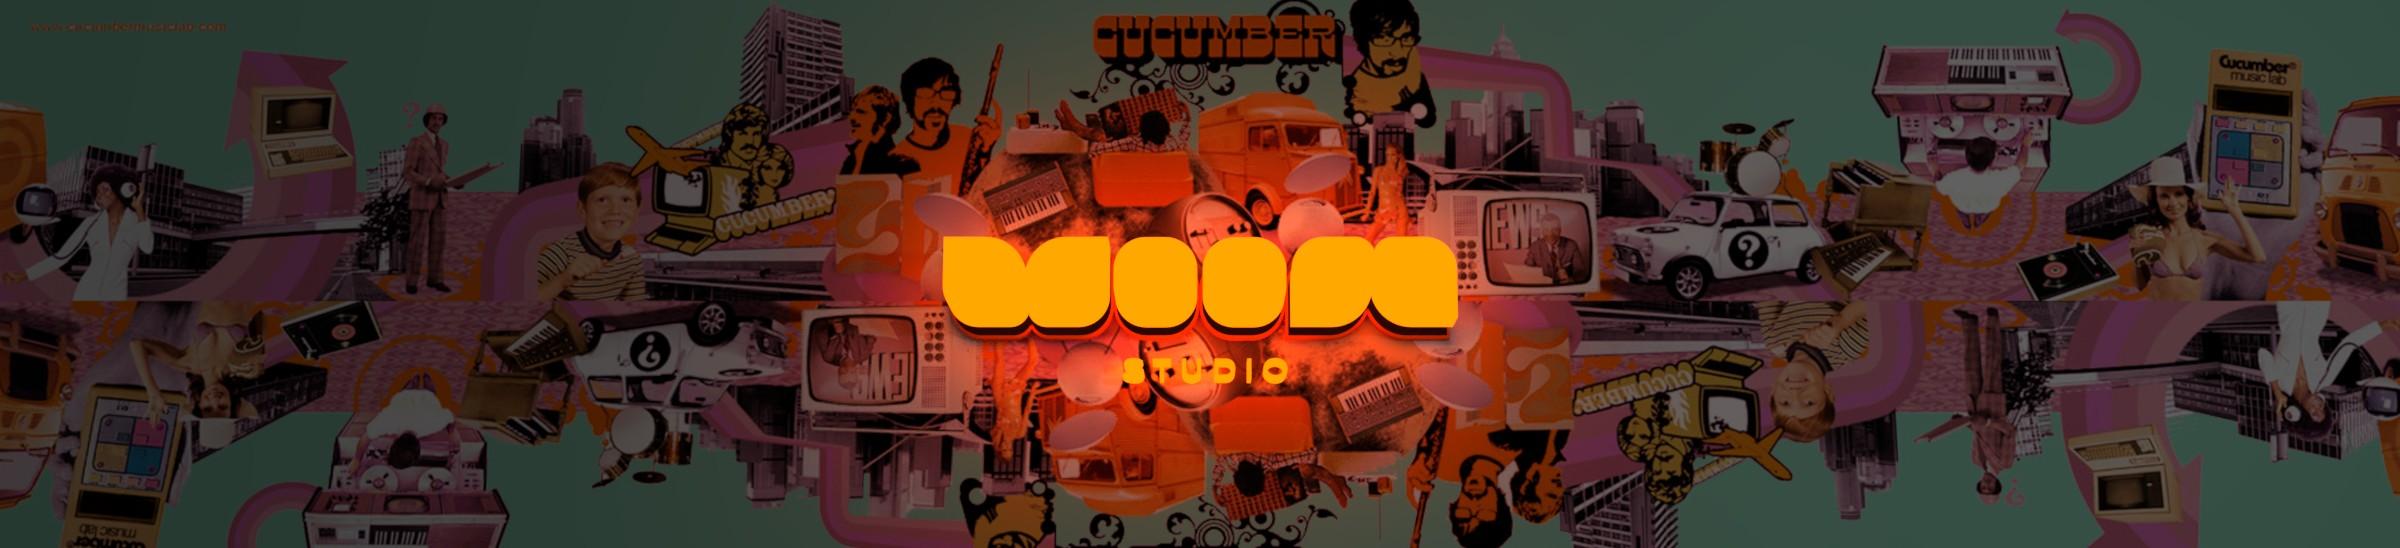 Woom-cucumber-02